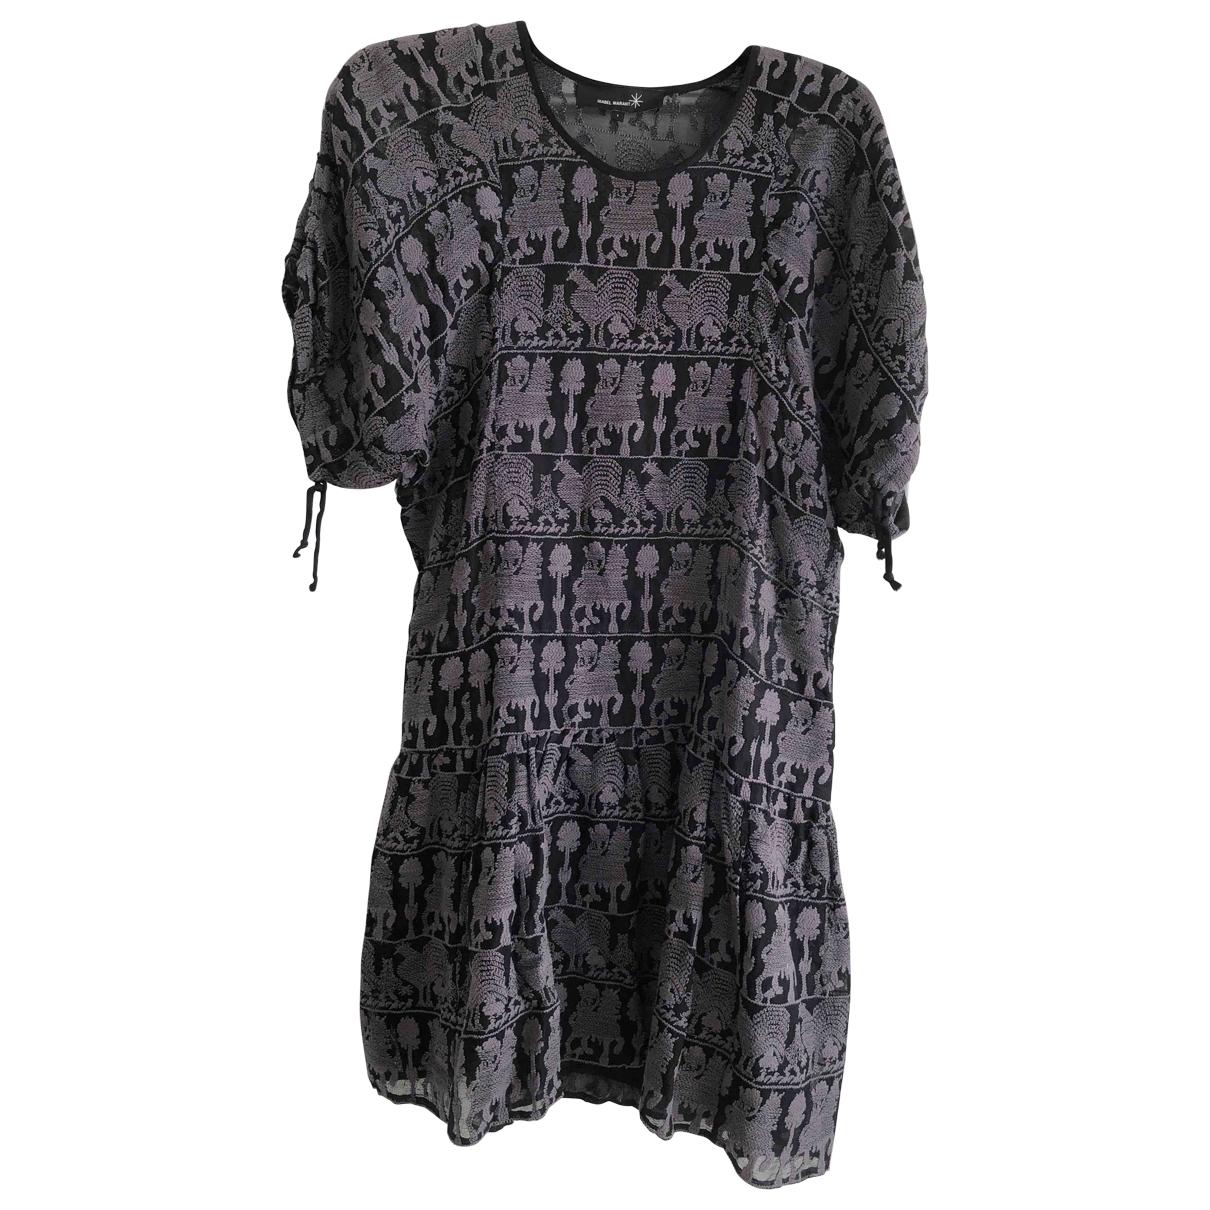 Isabel Marant \N Black dress for Women 36 FR